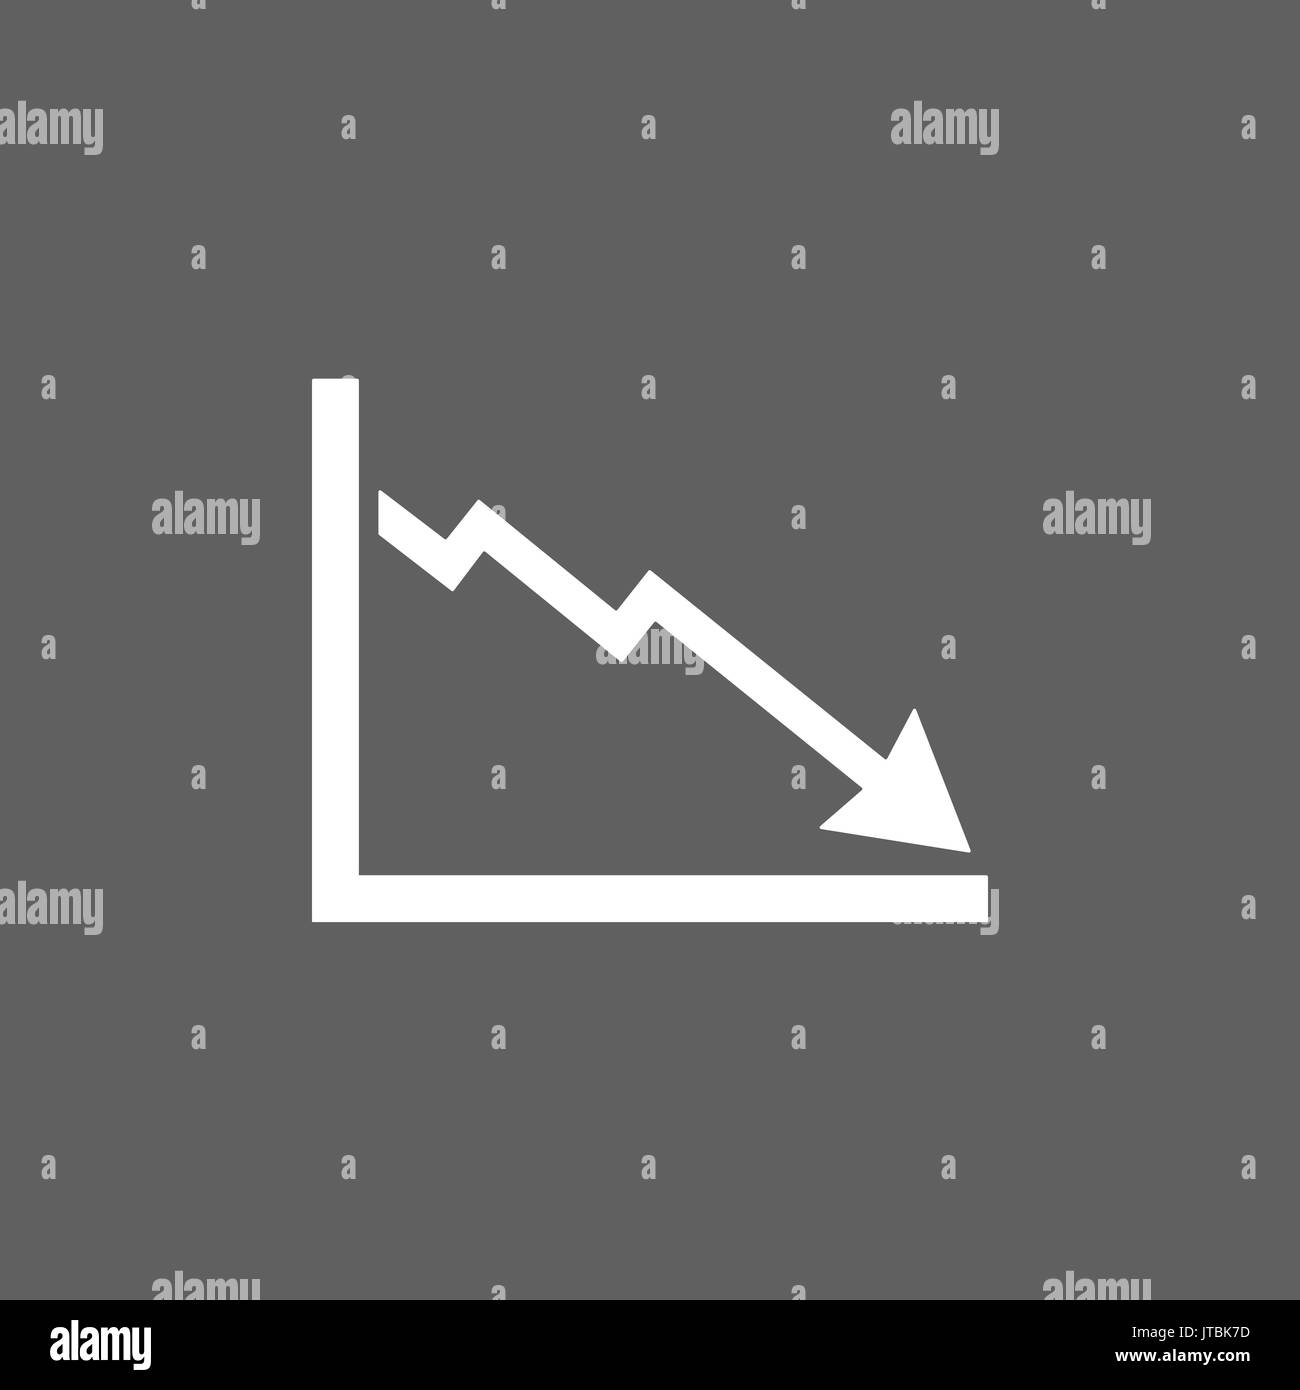 Bankruptcy chart icon on dark background - Stock Image